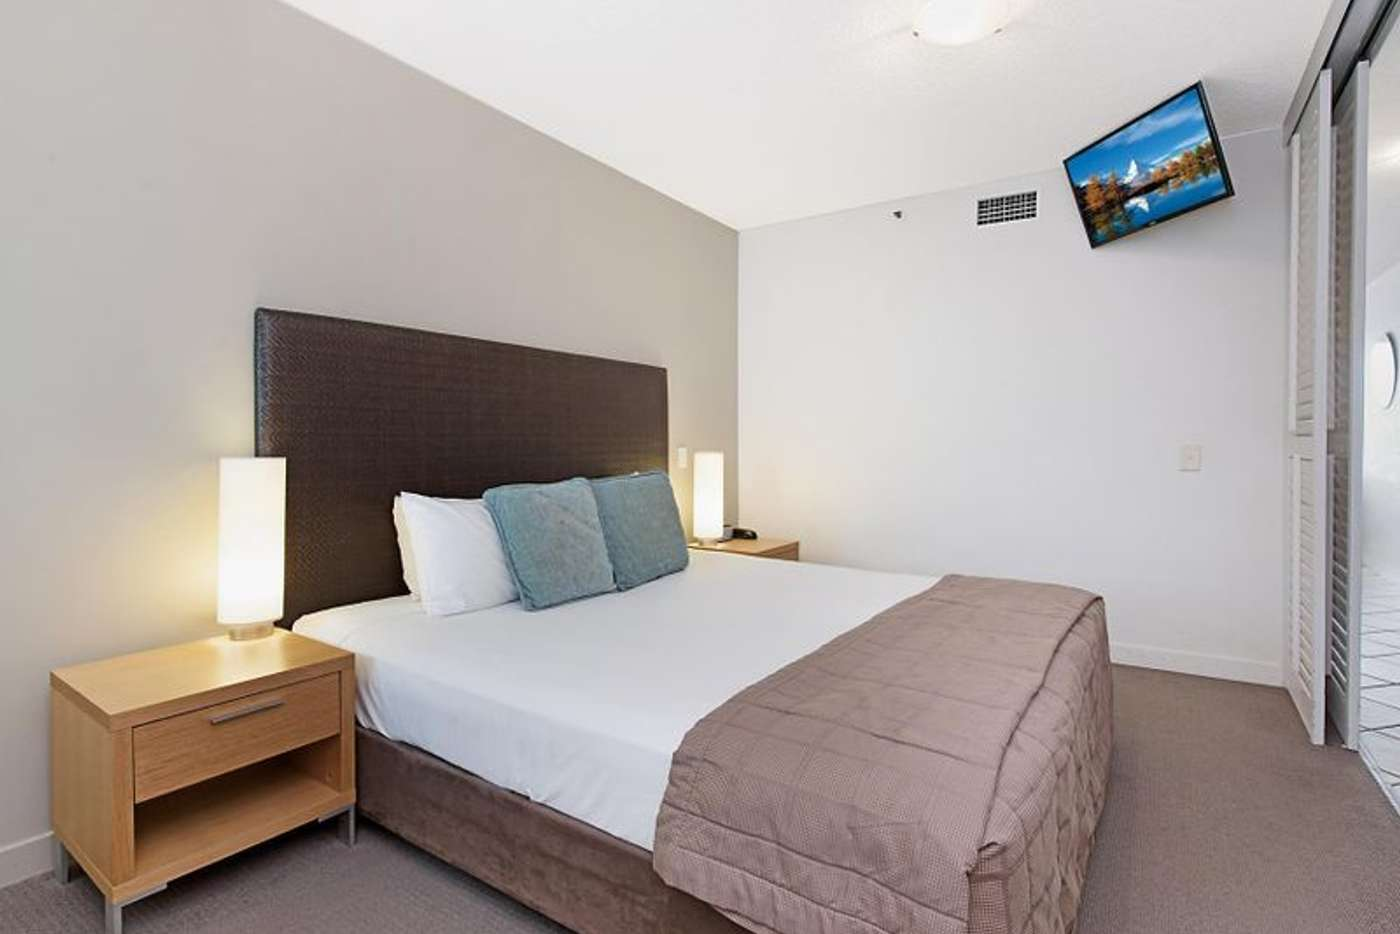 Sixth view of Homely unit listing, 610/7 Venning Street, Mooloolaba QLD 4557